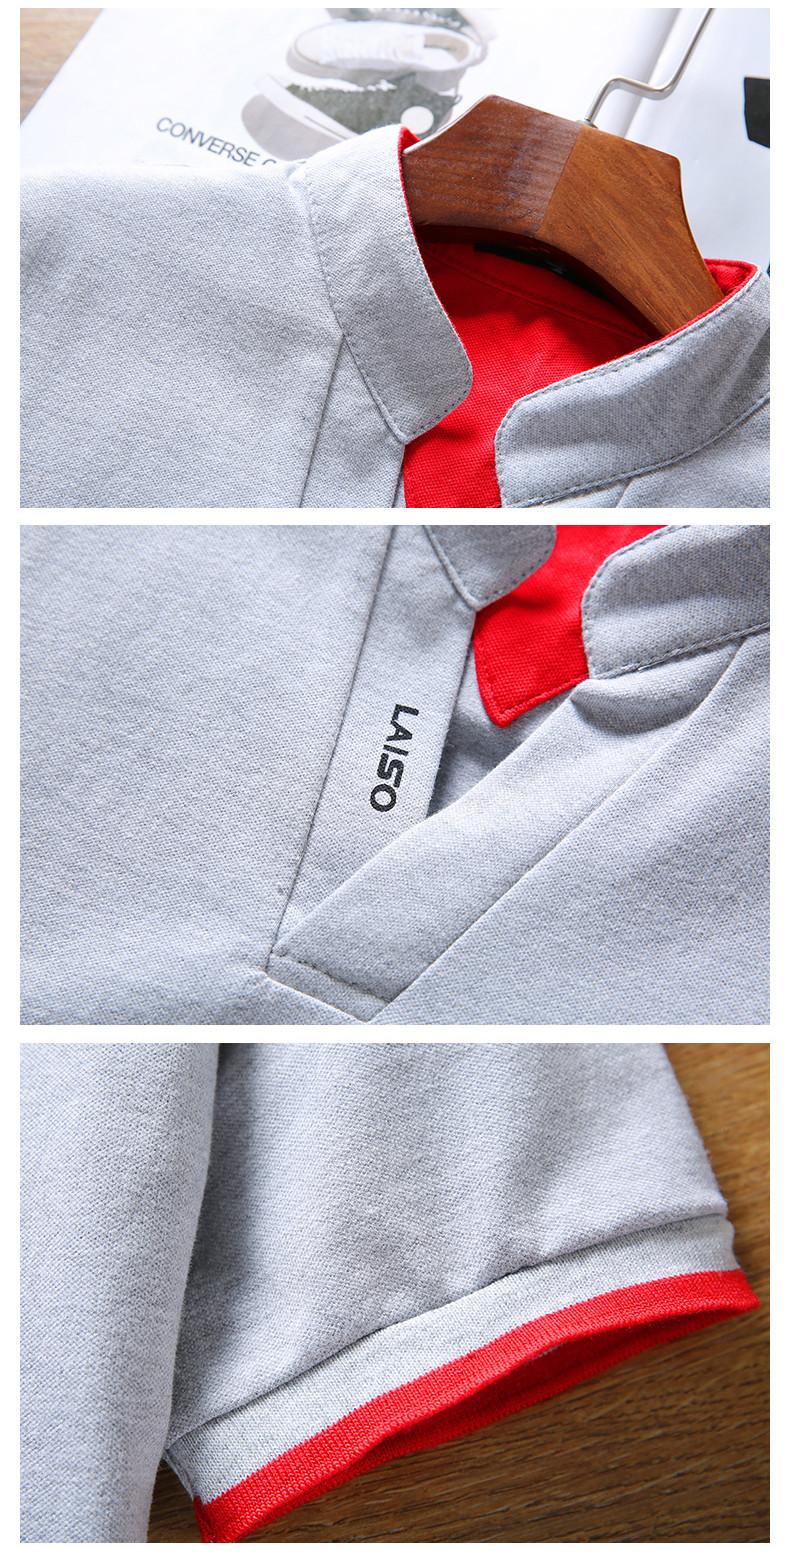 2019 New Arrival Cotton Men Polo Shirt Tops Fashion Brand Plus Size Short Sleeve Black White Polo Shirt Homme Camisa 5XL 22